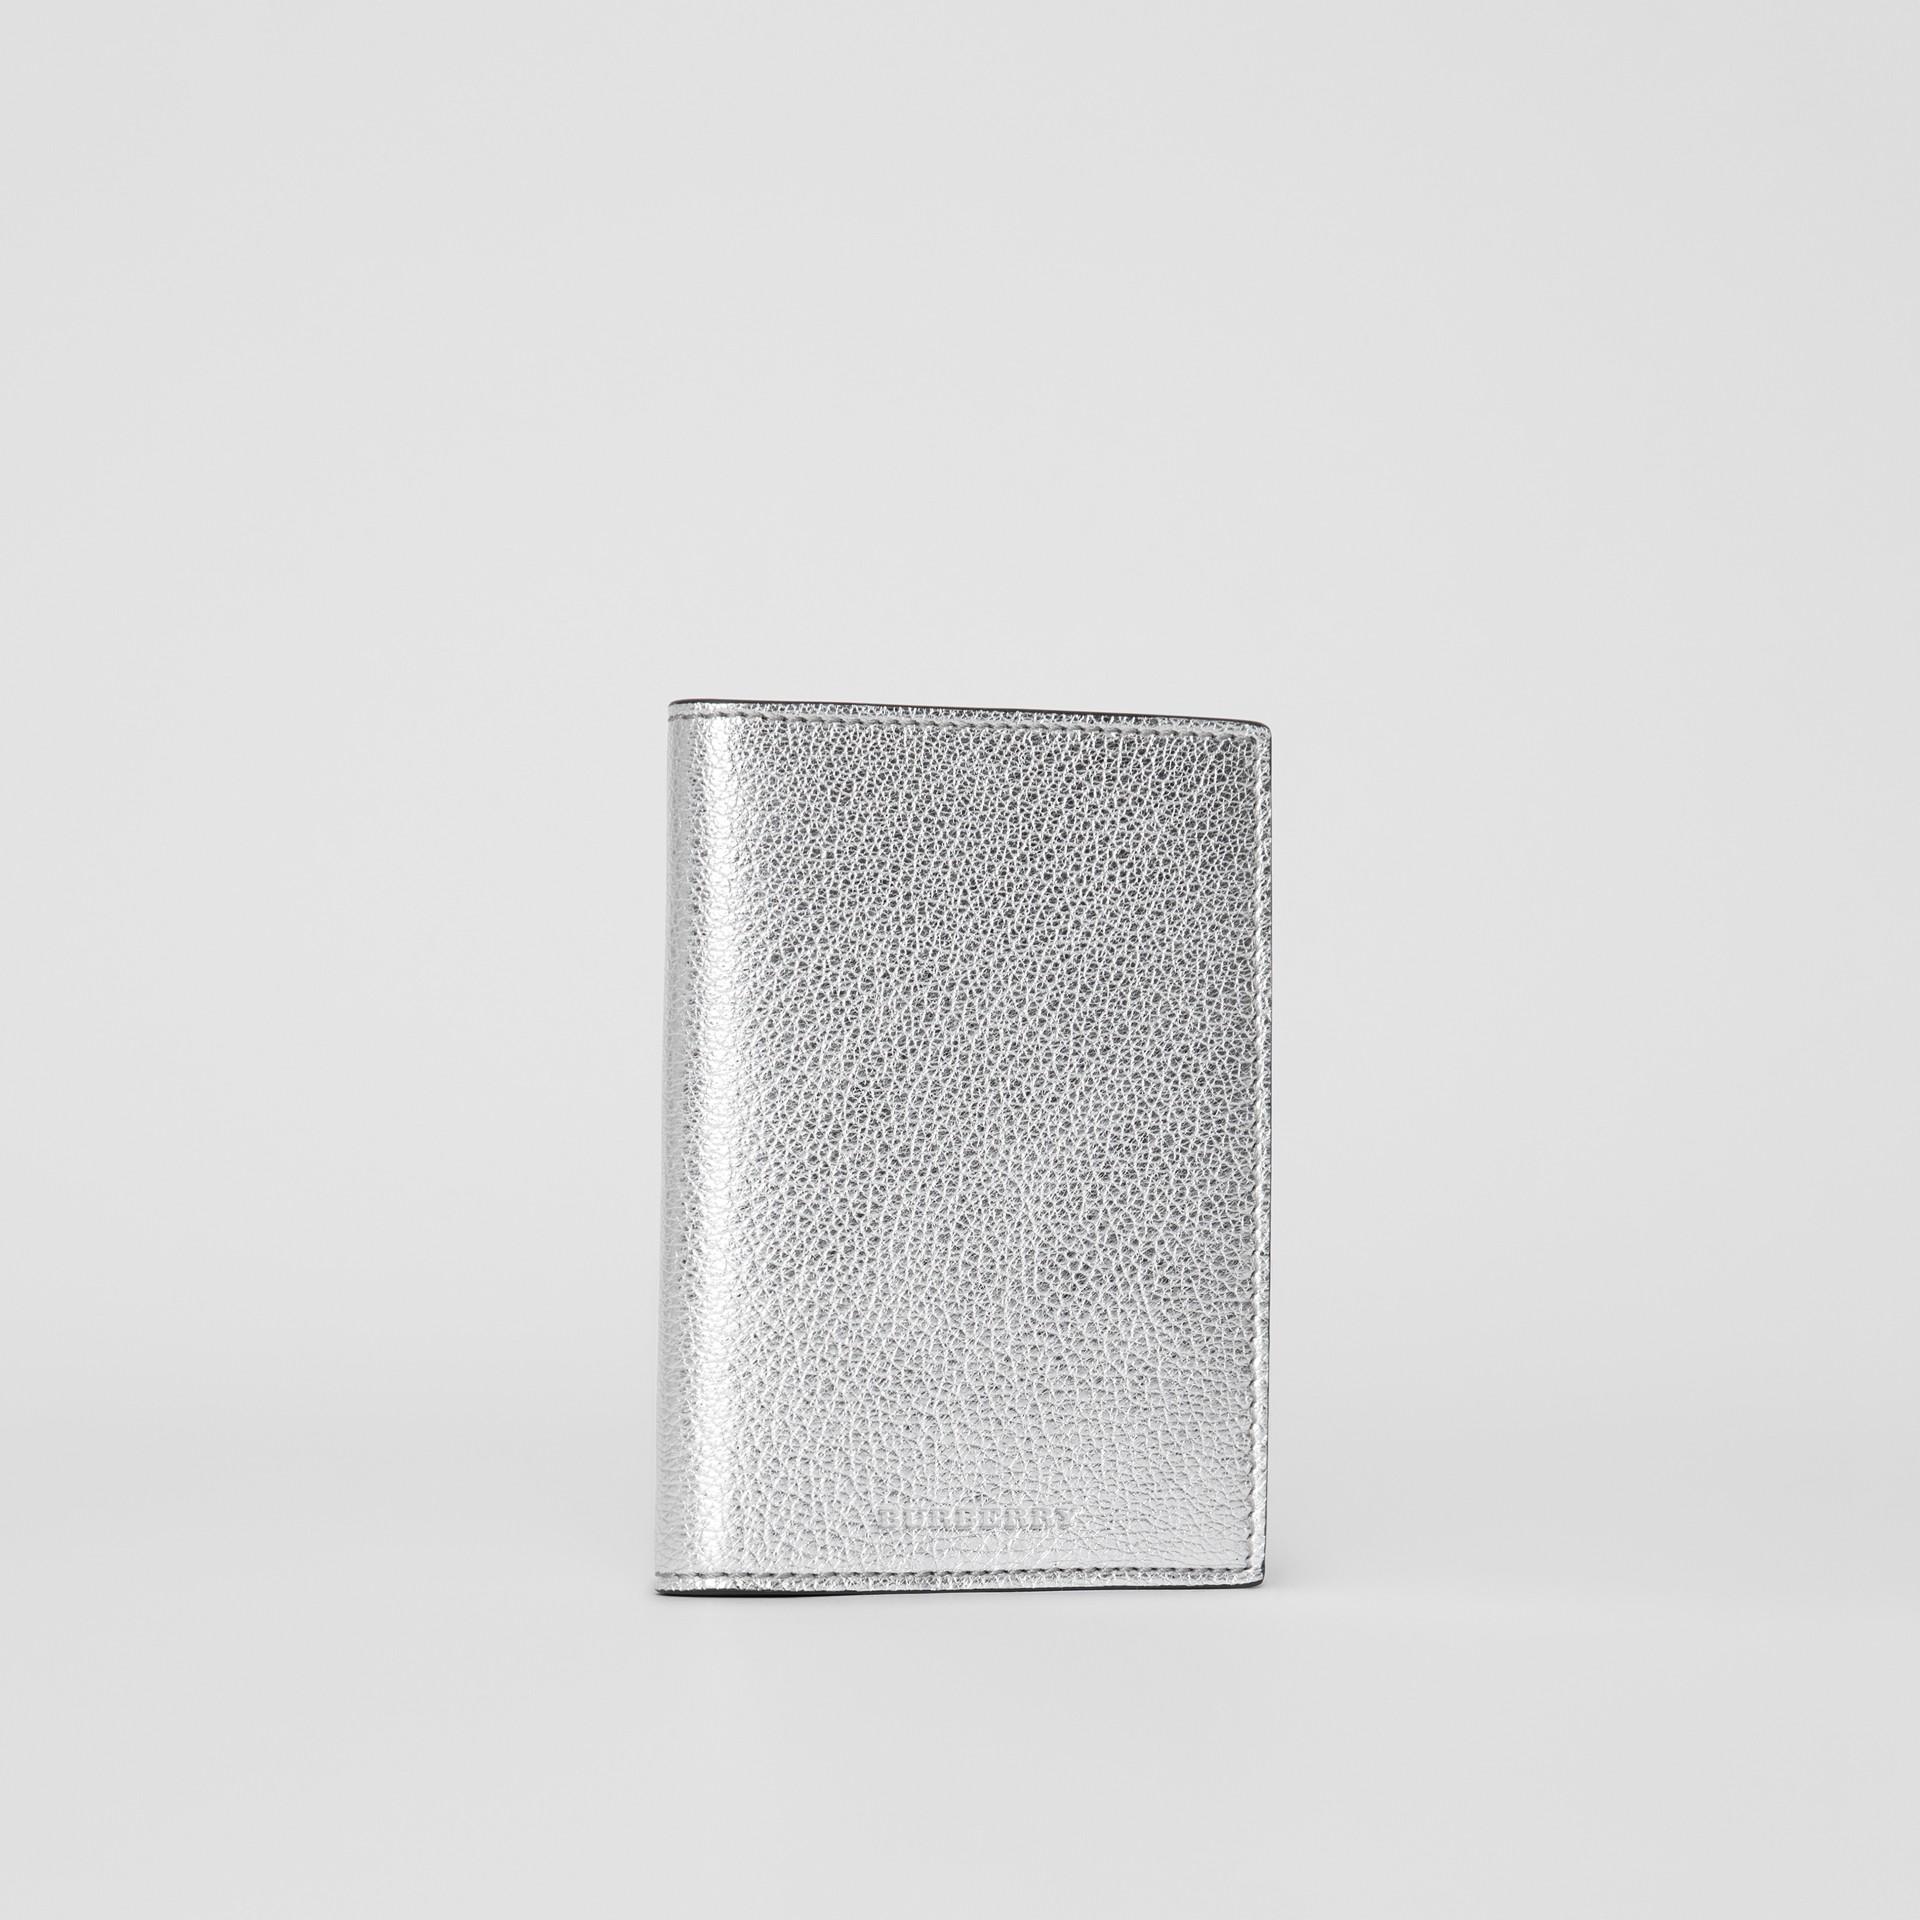 Metallic Leather Passport Holder in Silver - Women | Burberry Australia - gallery image 3